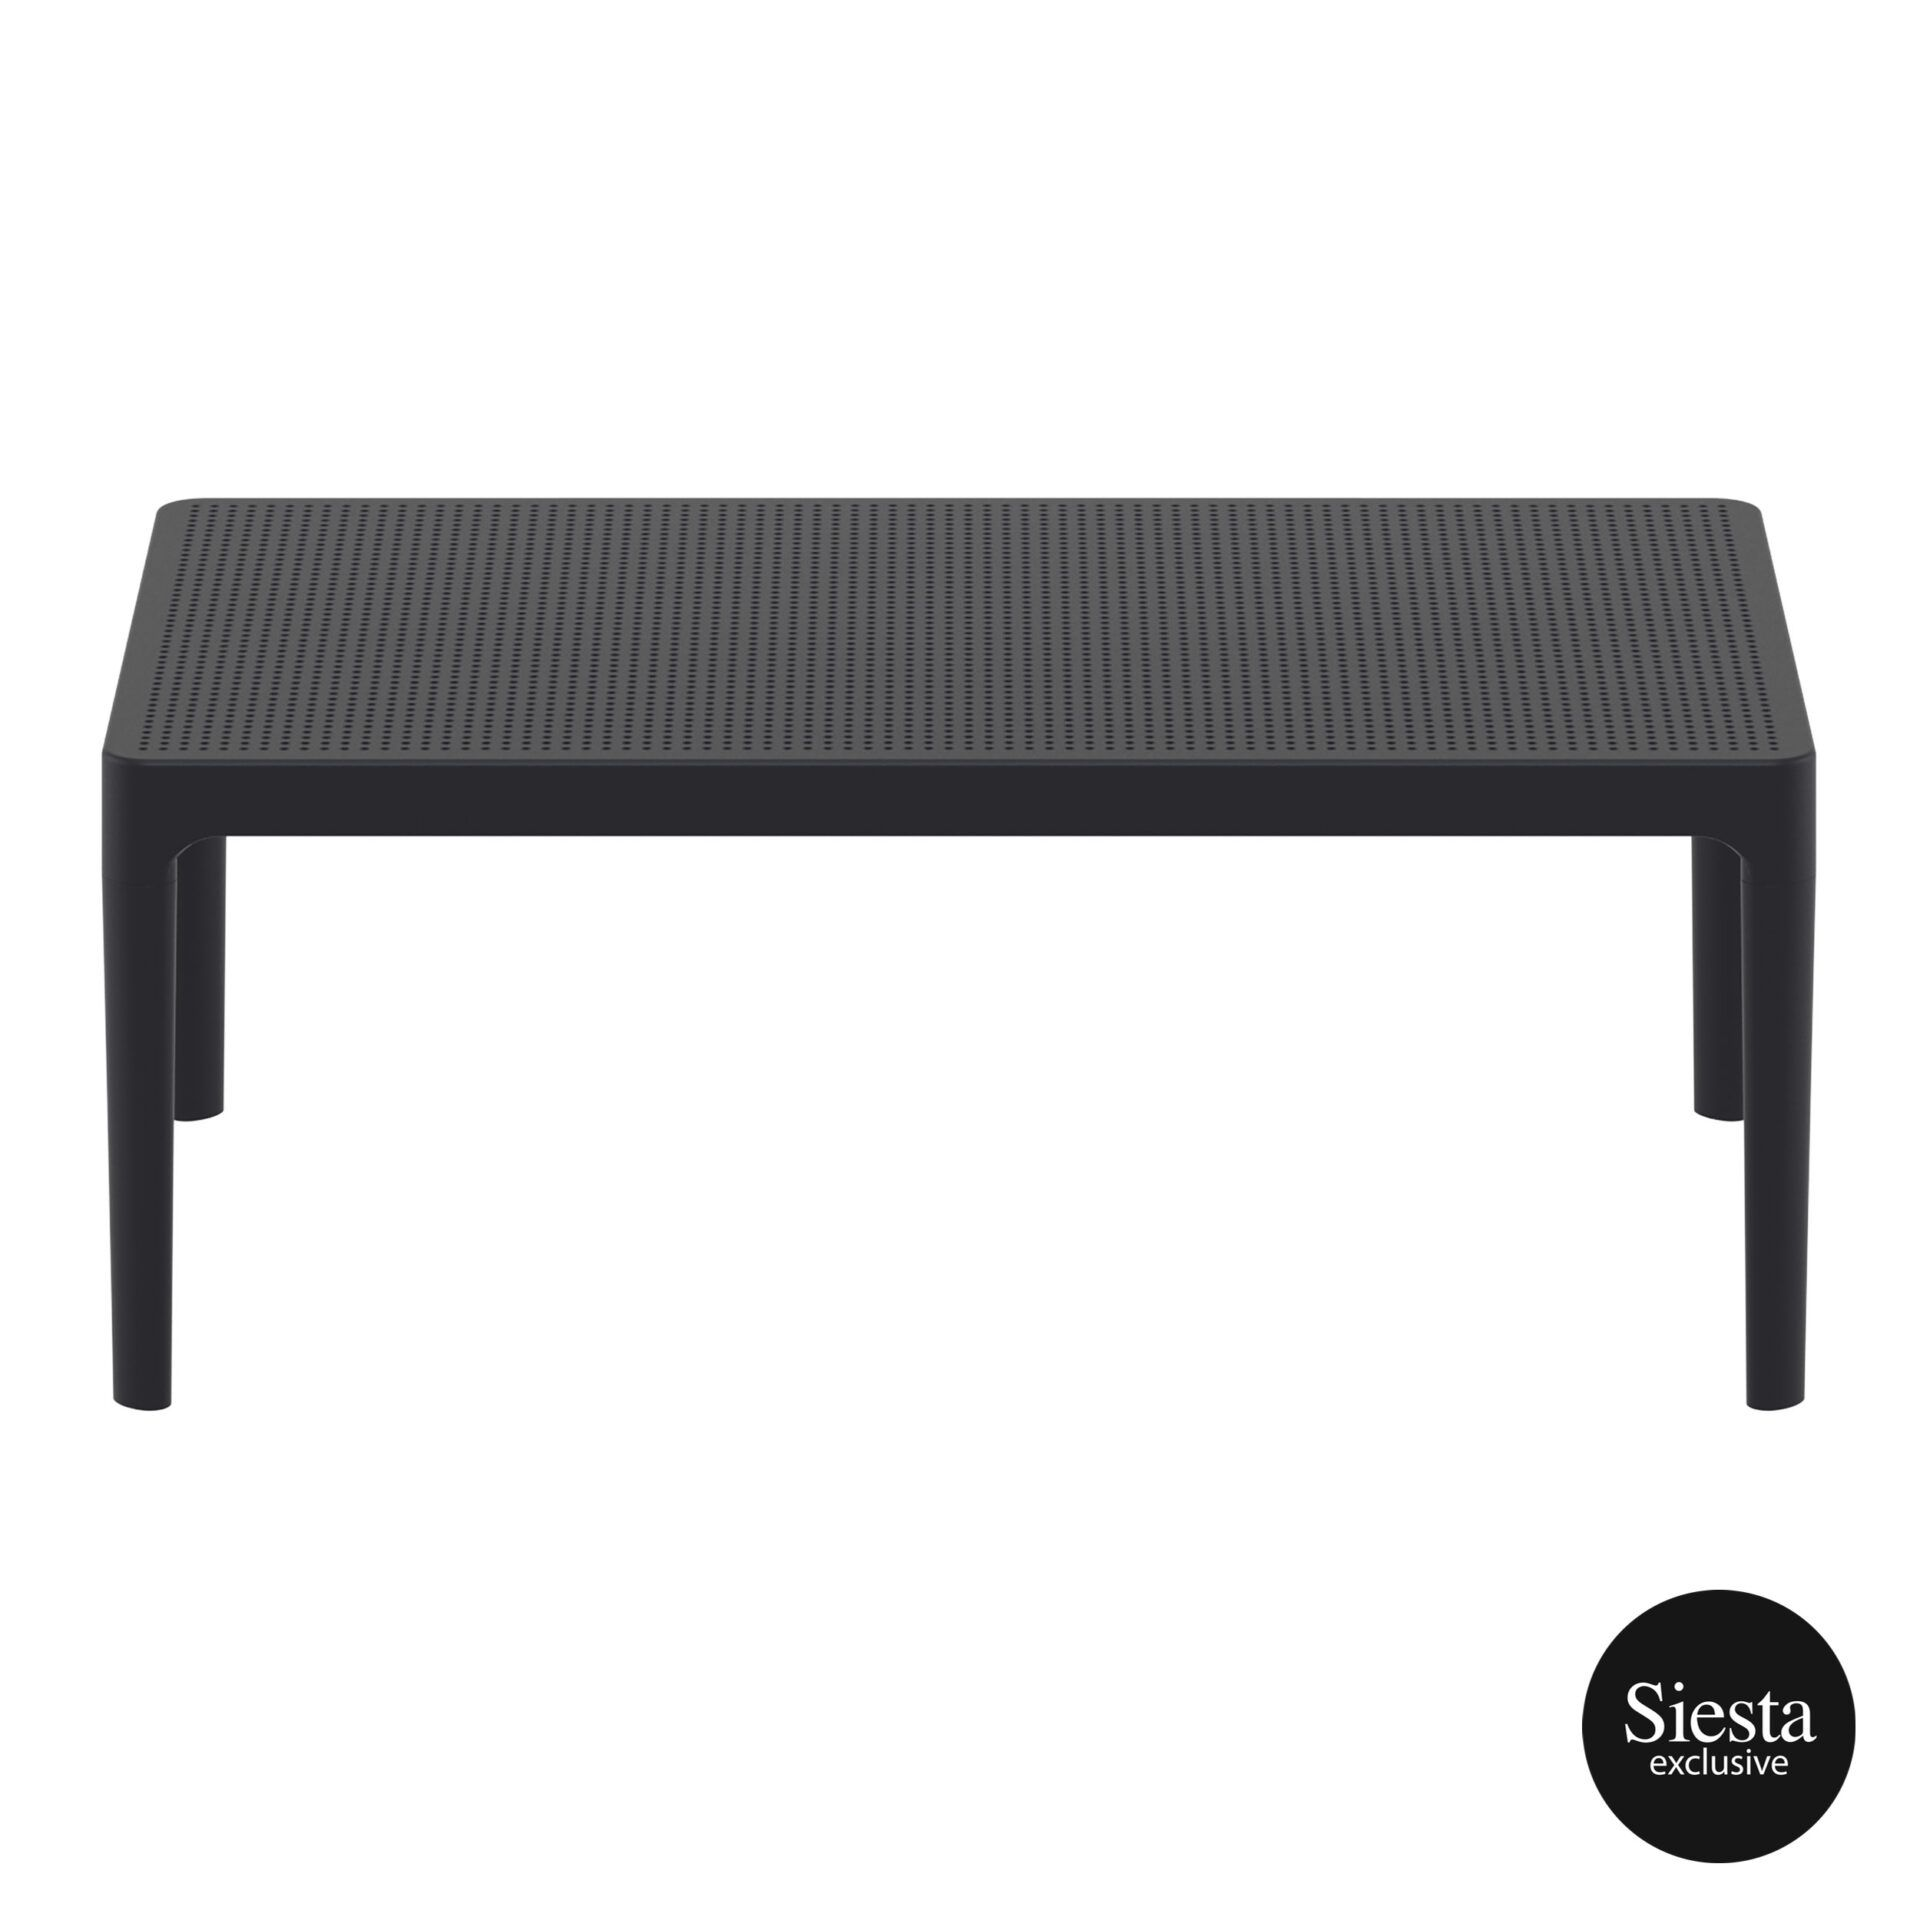 polypropylene outdoor sky lounge coffee table black long edge 1